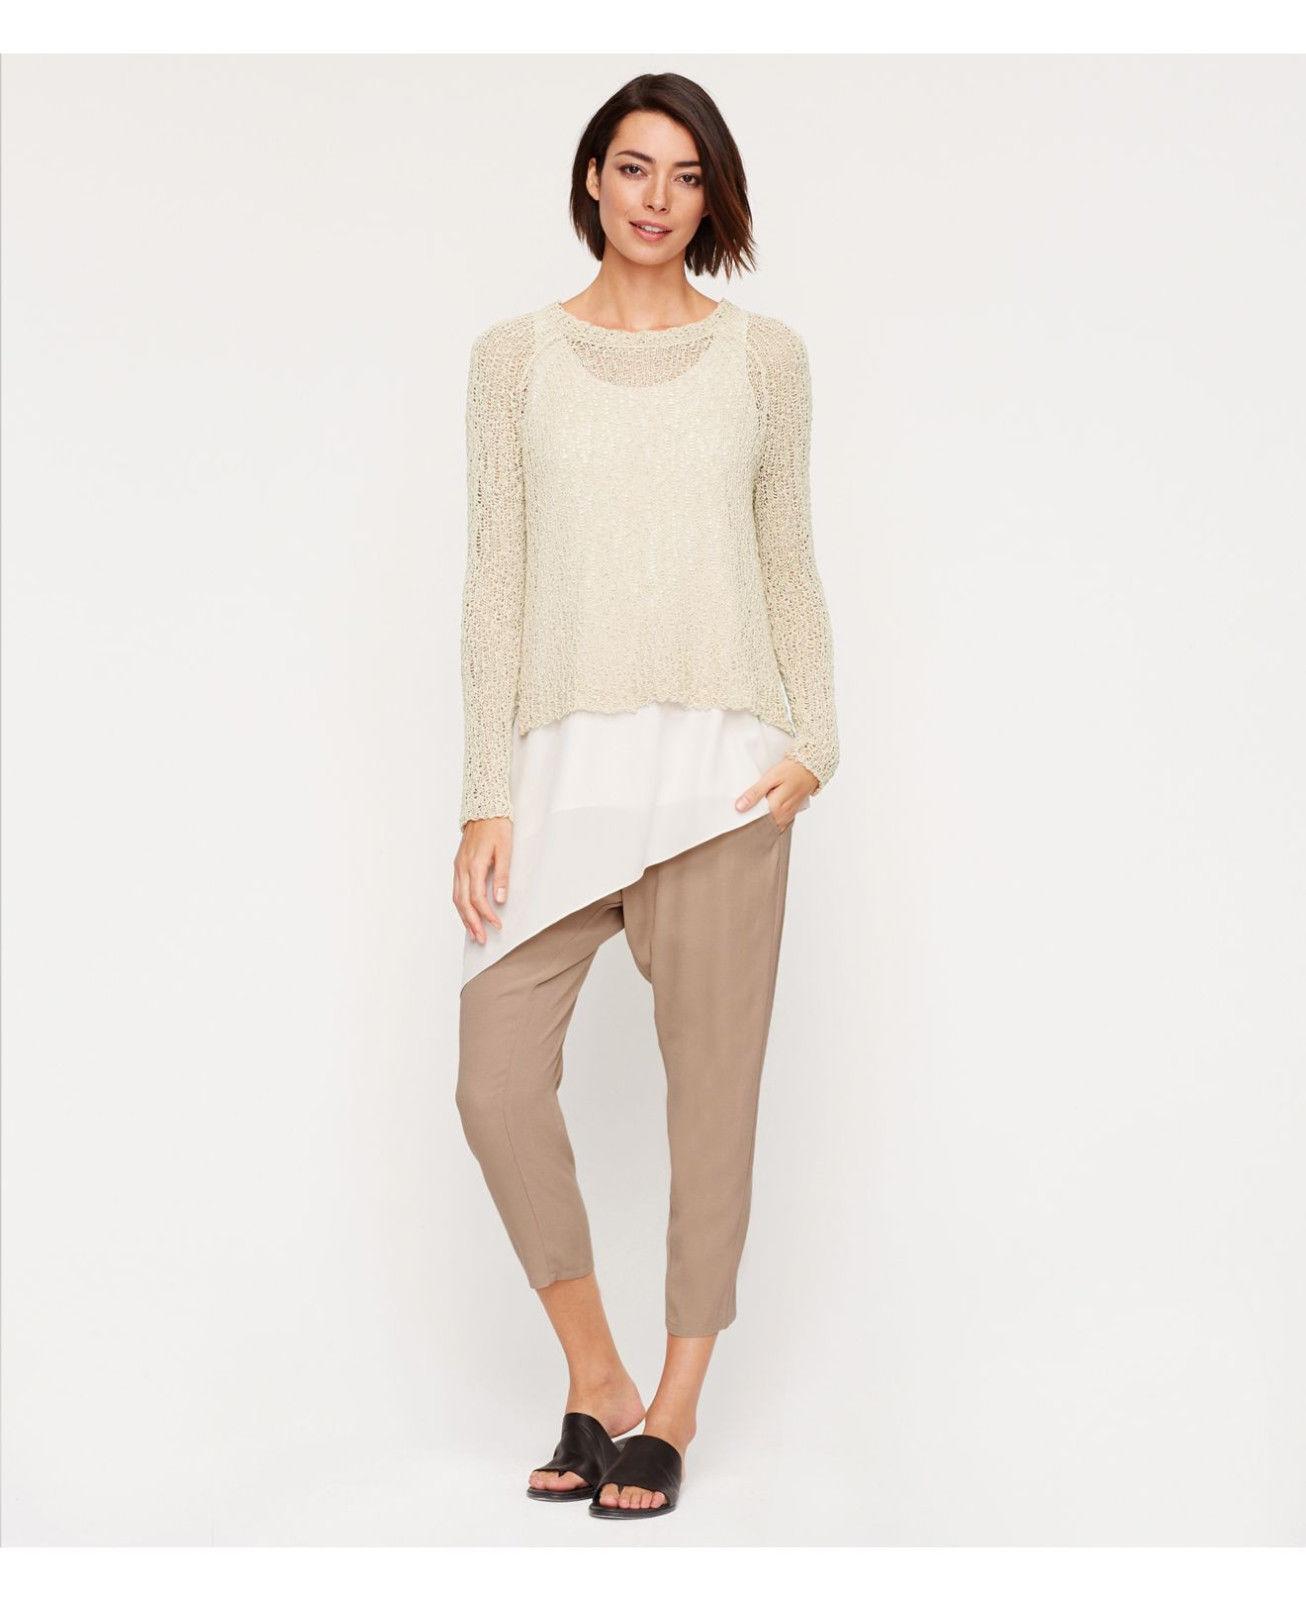 Eileen Fisher Mocha Slouchy Drawstring Harem Crop Pants 3X  278